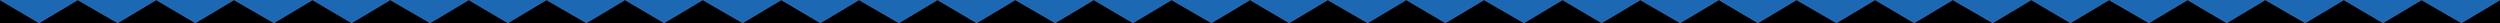 PACG logo frame narrow.png